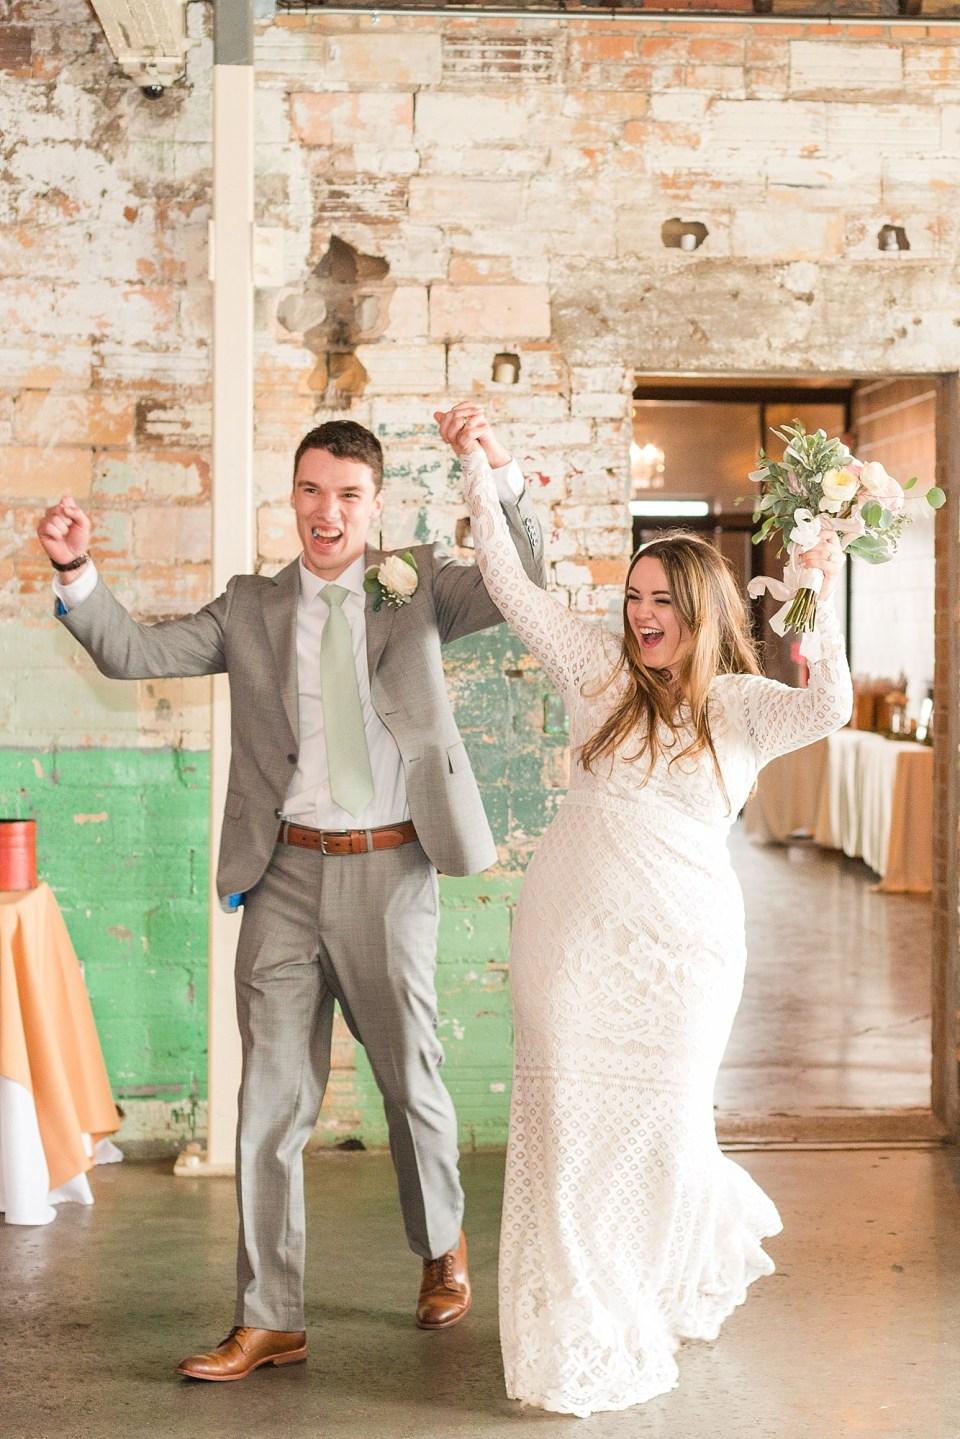 A newlywed couple dances into their wedding reception